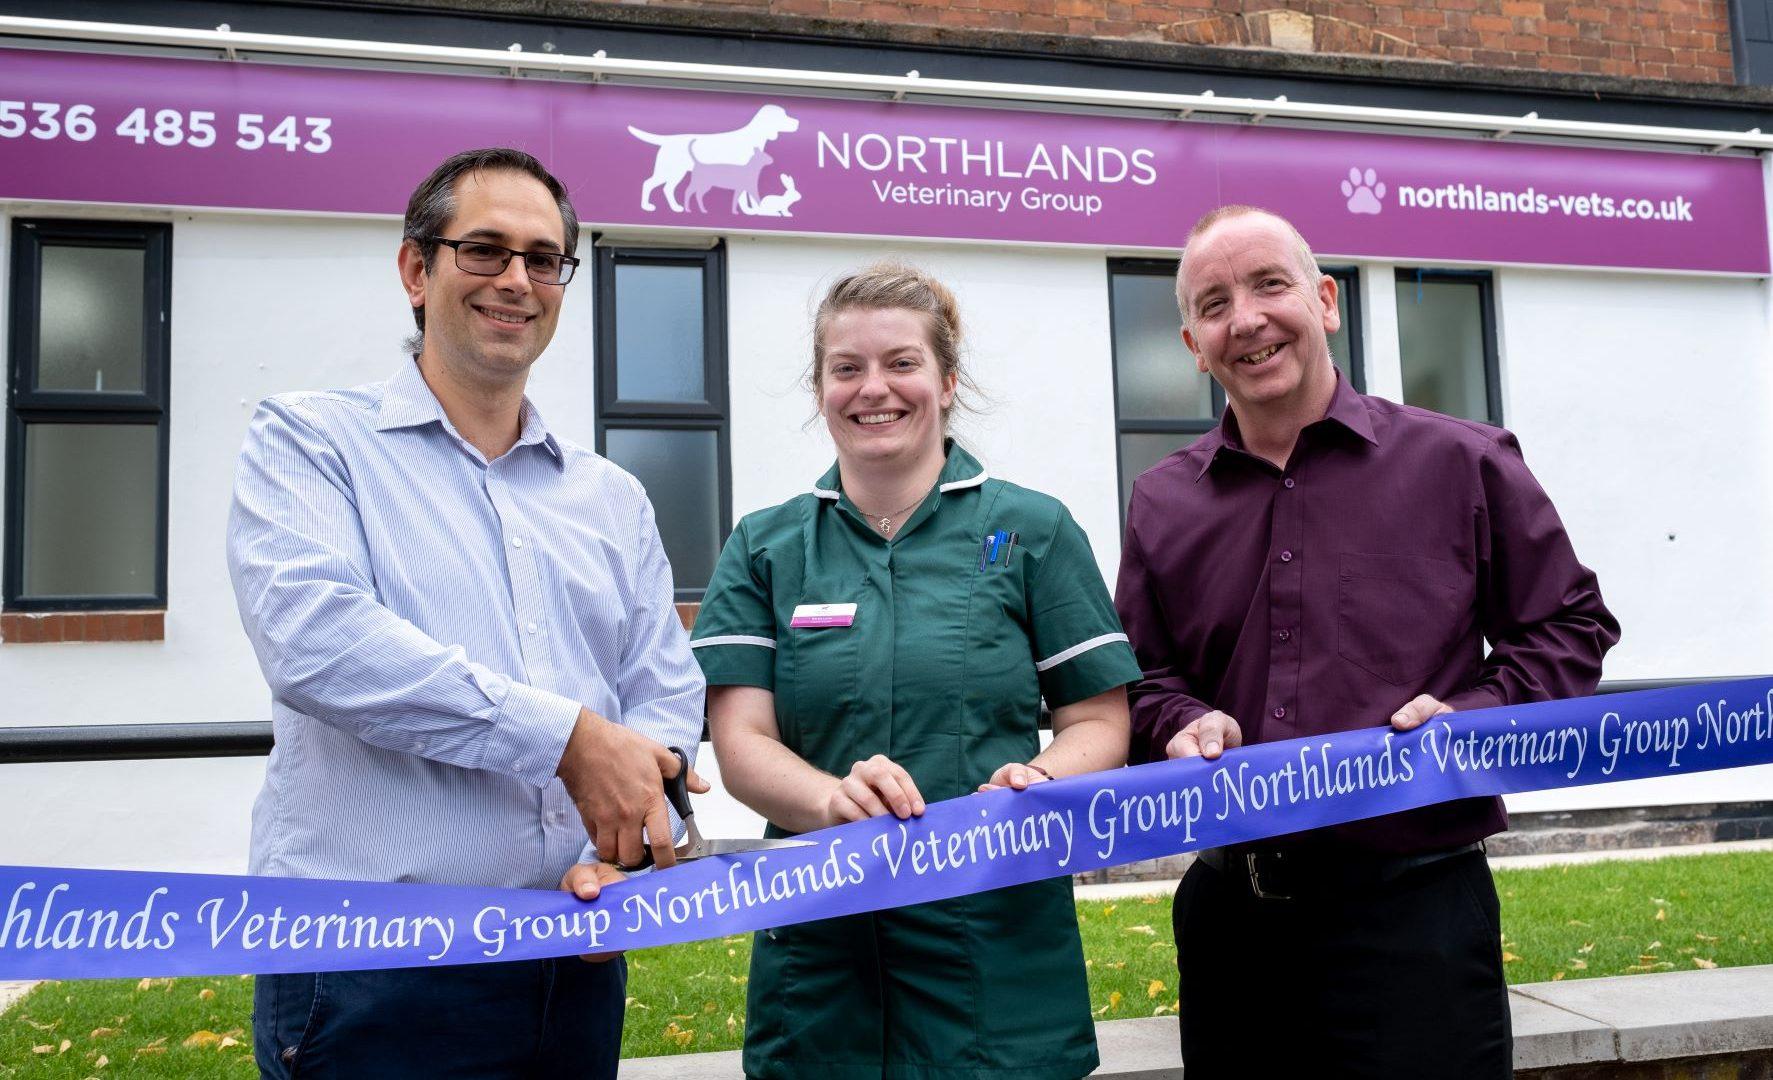 New flagship veterinary hospital opens its doors